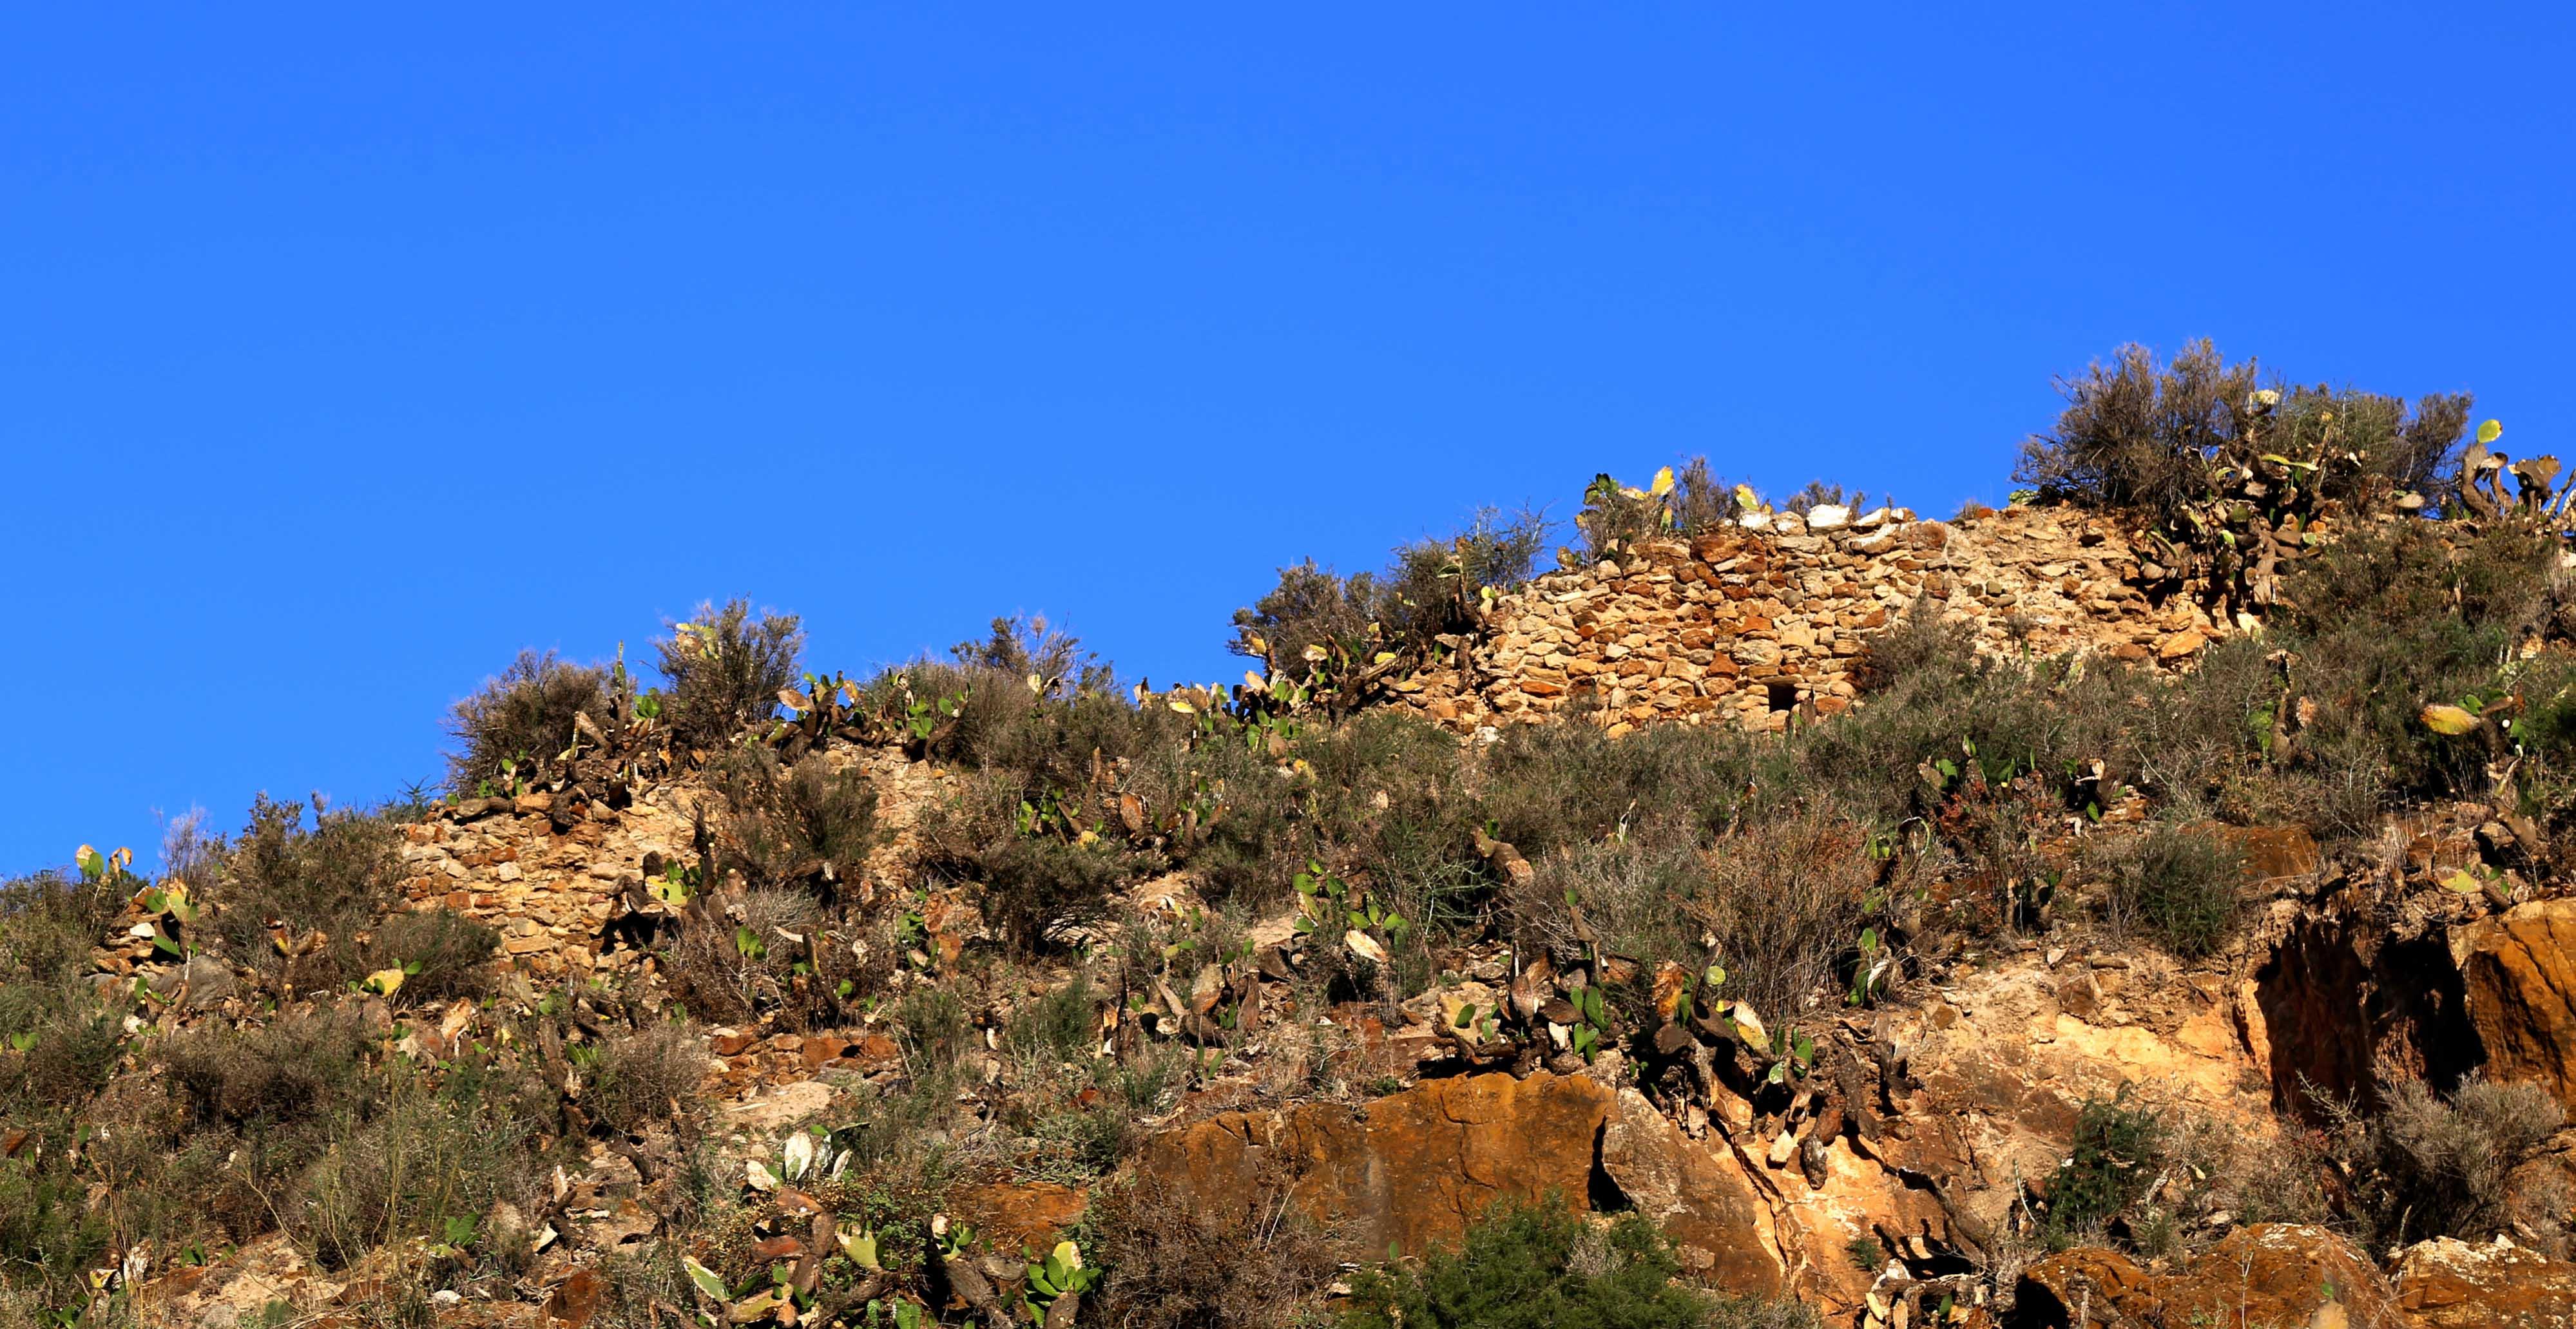 Lugar Viejo o Cantoria hispanomusulmana. Restos de murallas nazaríes. © Fotografía: Pako Manzano